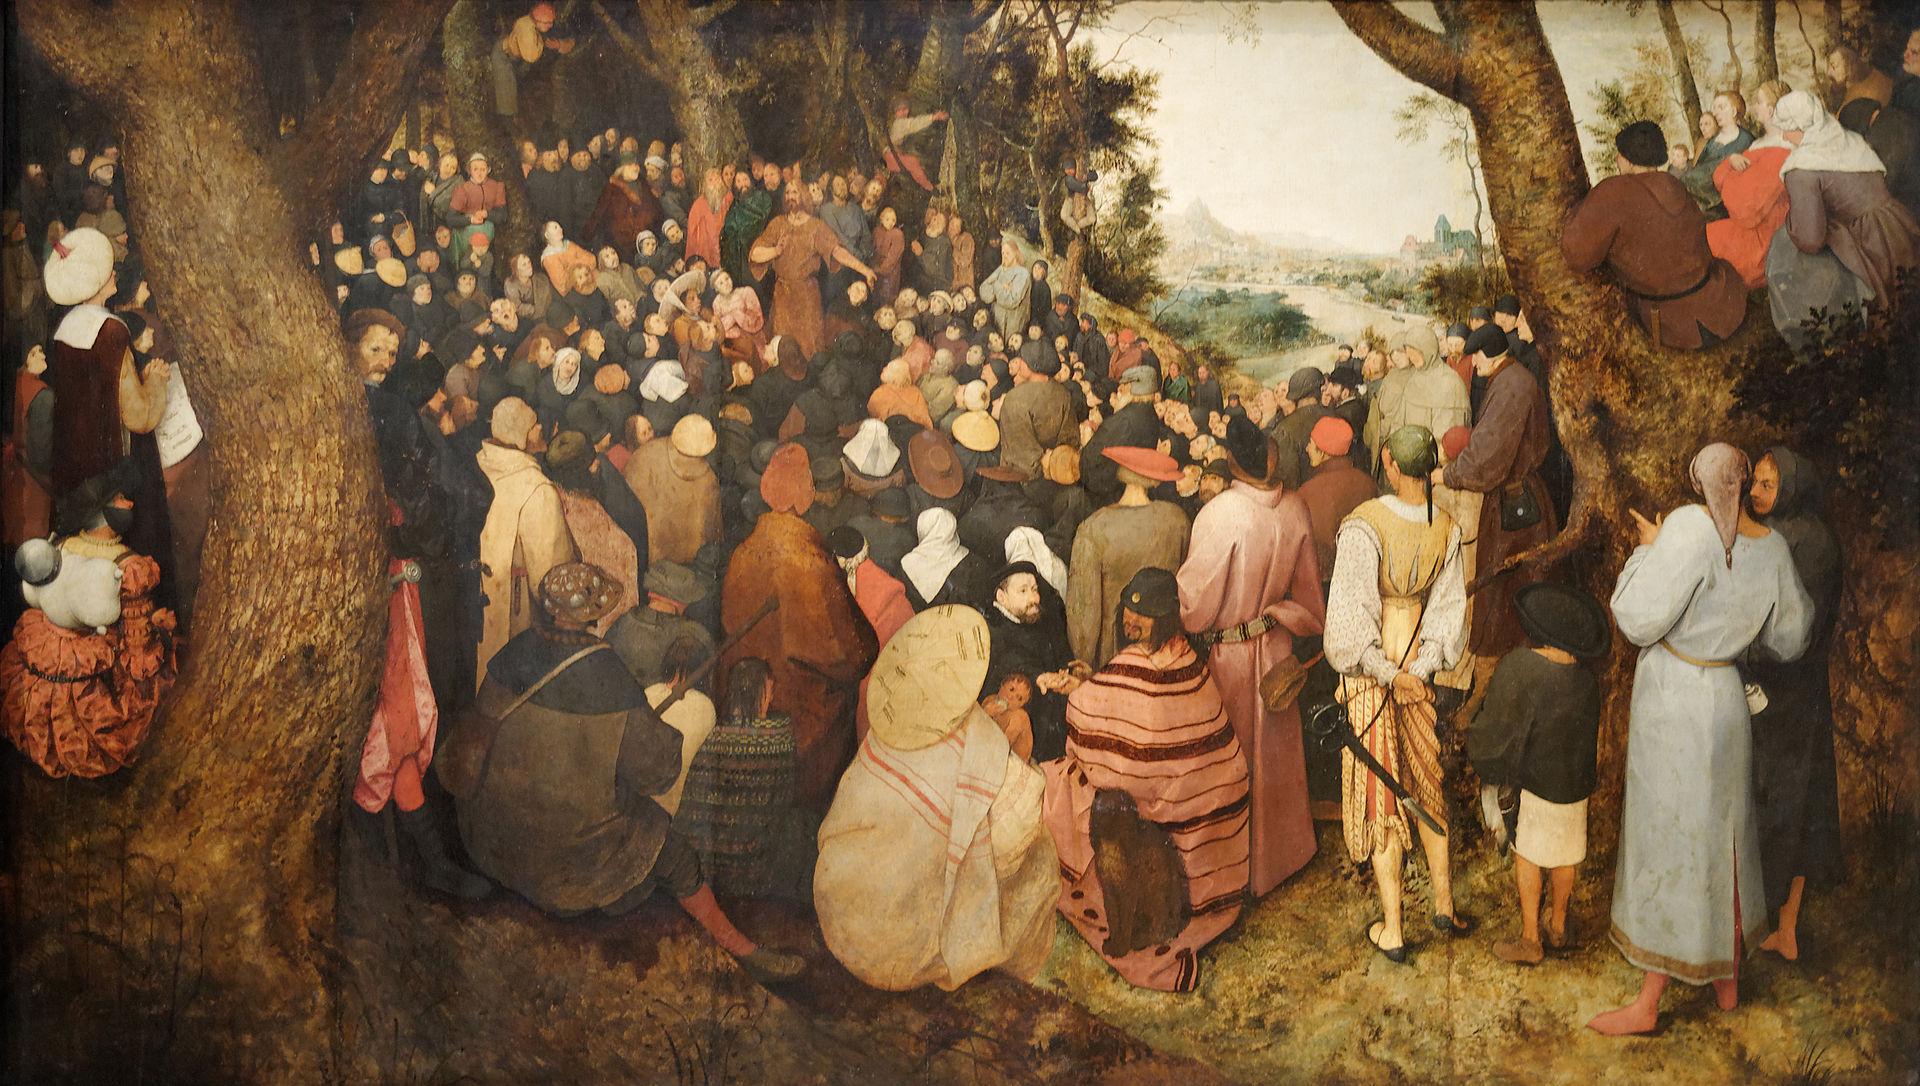 The Preaching of St. John the Baptist by Pieter Bruegel the Elder, 1526